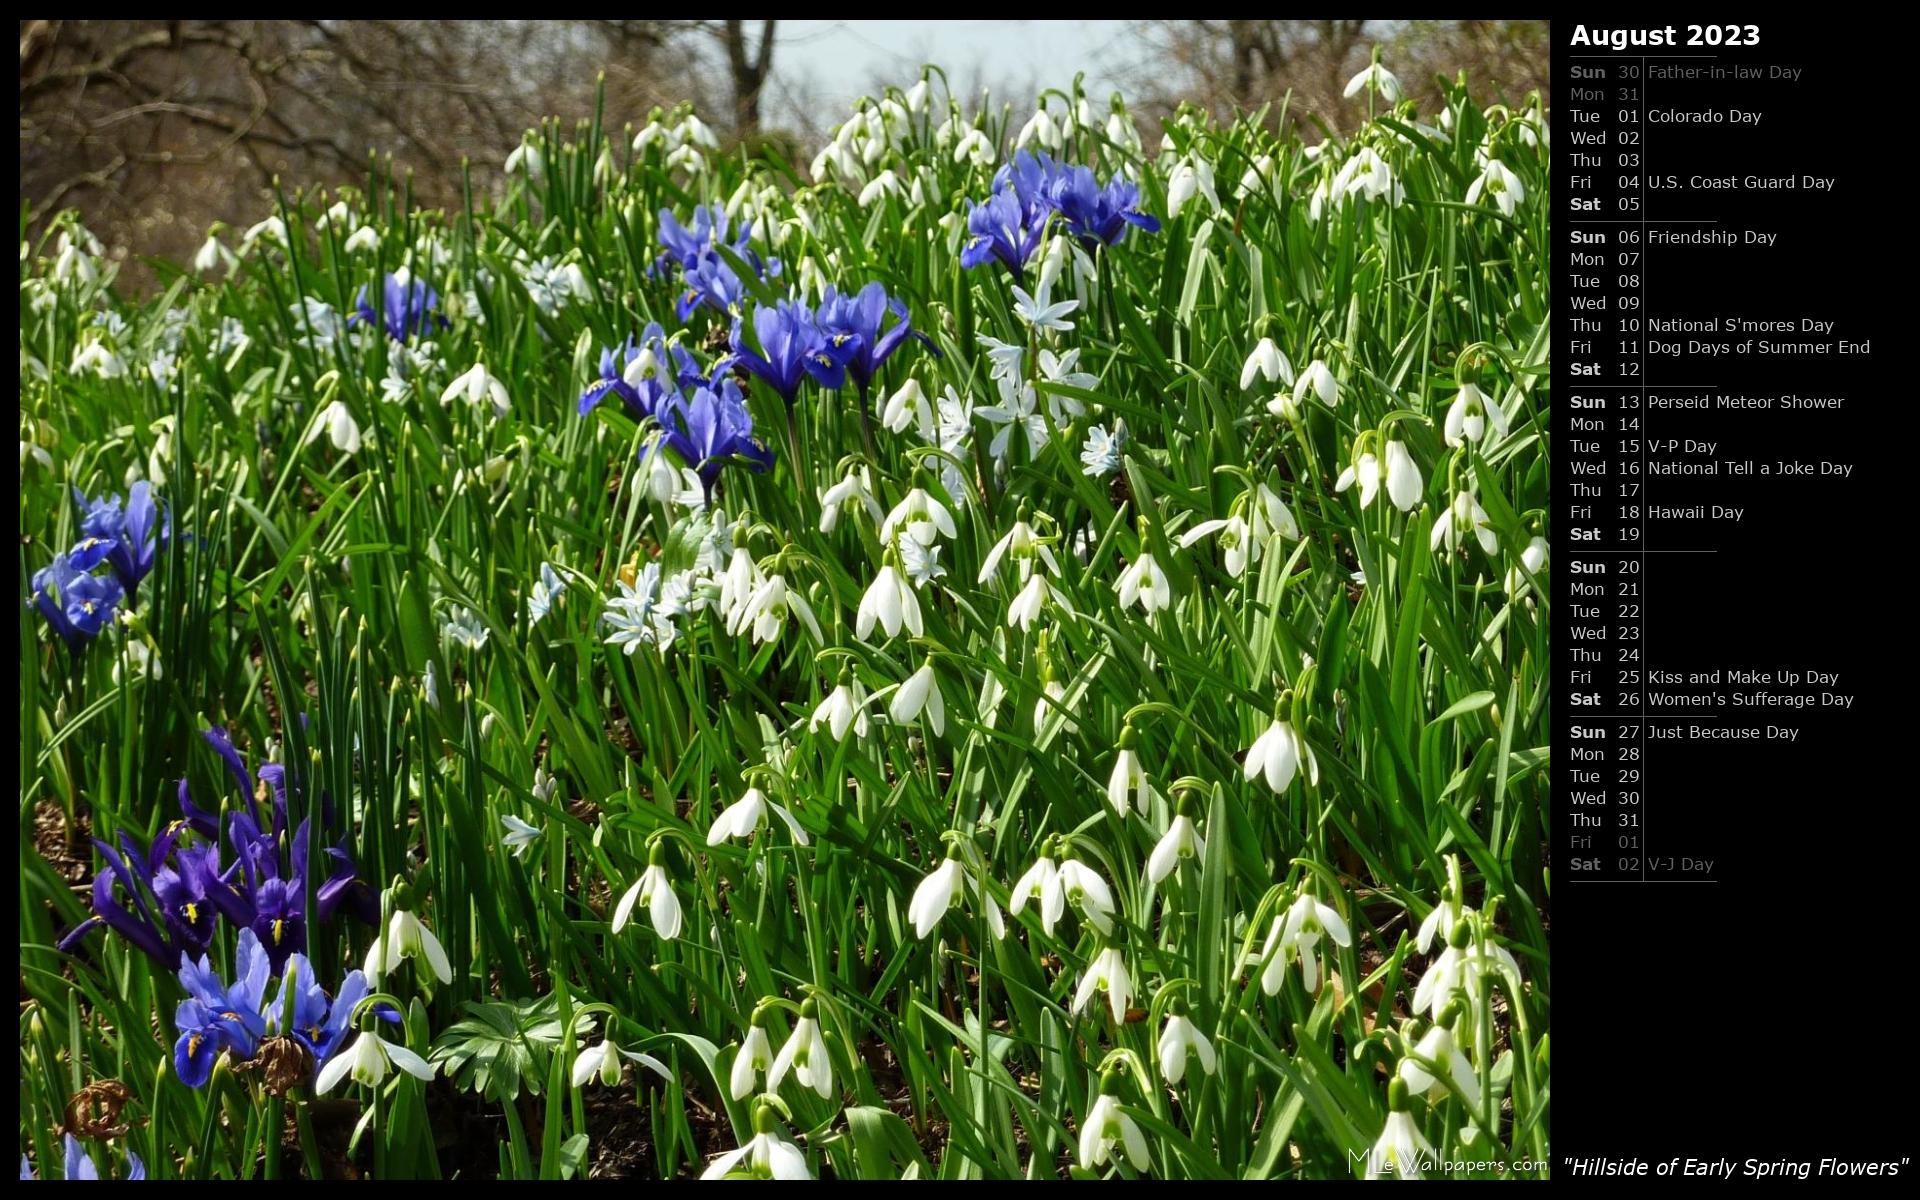 Mlewallpapers Hillside Of Early Spring Flowers Calendar